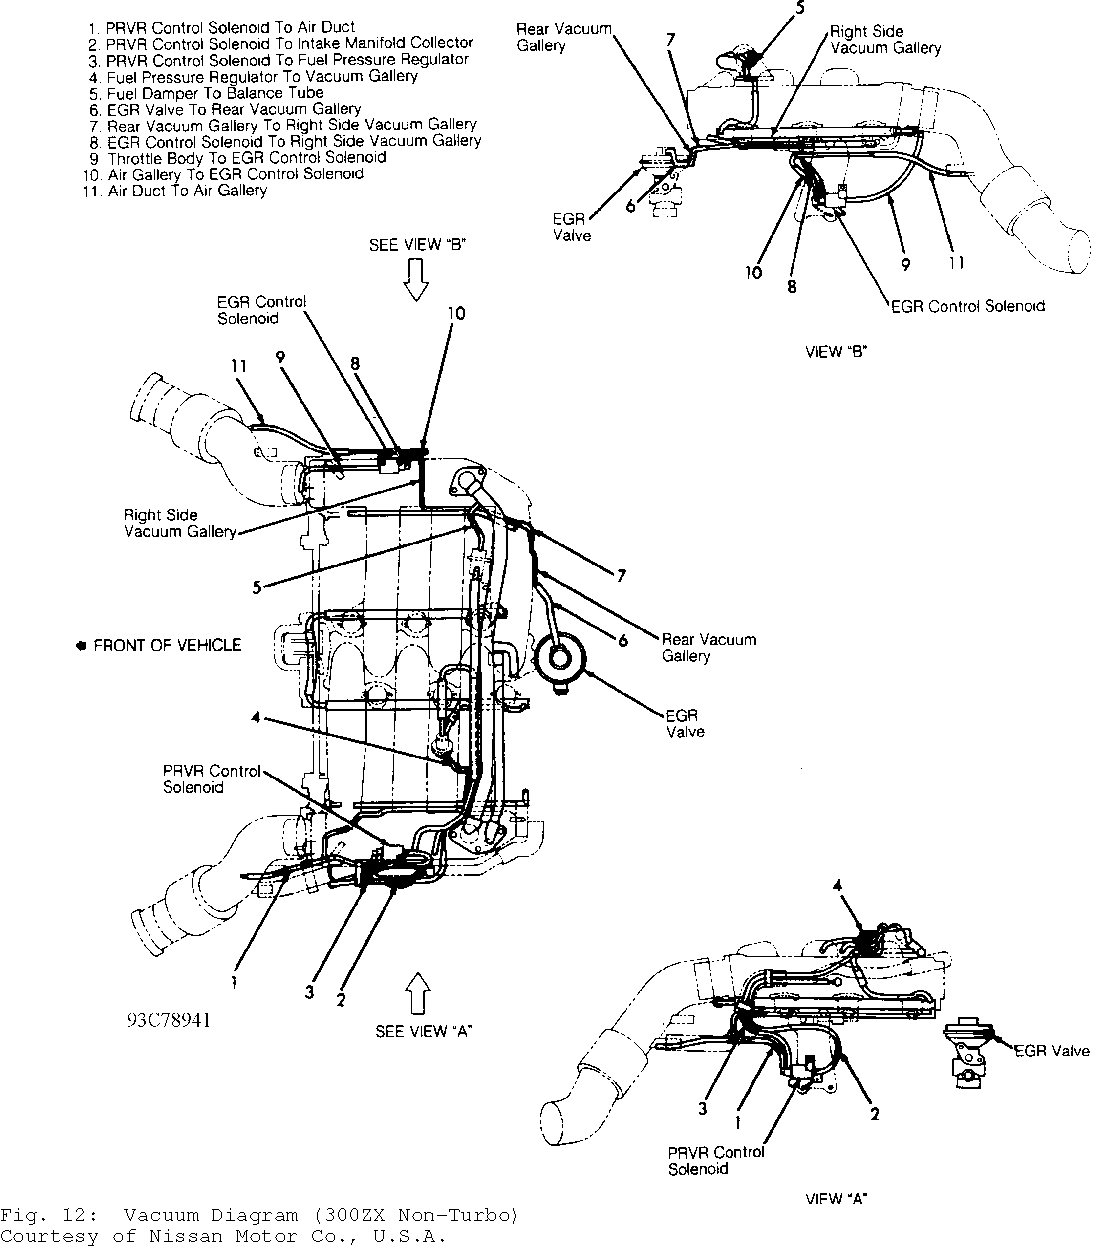 Fig 9 Vacuum Diagram Quest Courtesy Of Nissan Motor Co U S A